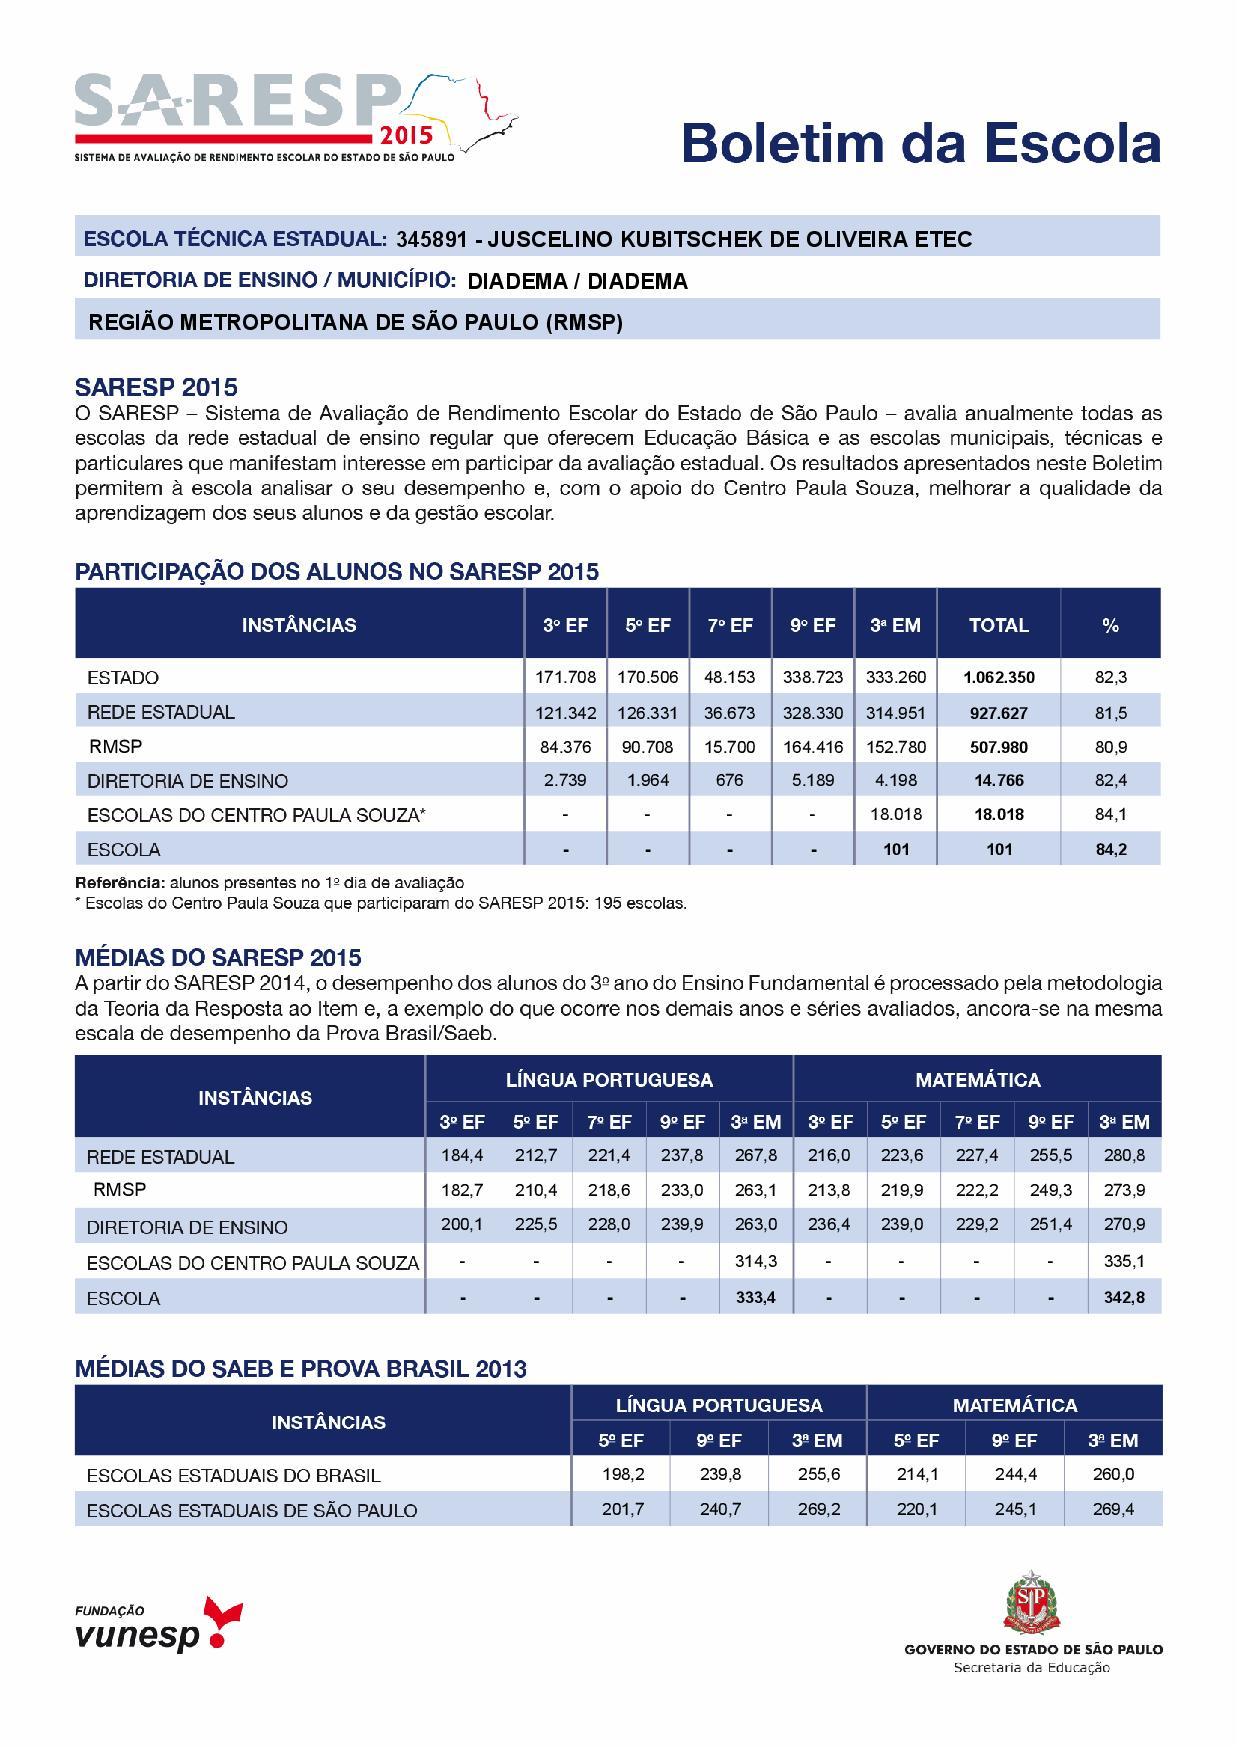 Boletim-ETE-2015_ETE_345891_1.pdf_saresp-page-001[1]